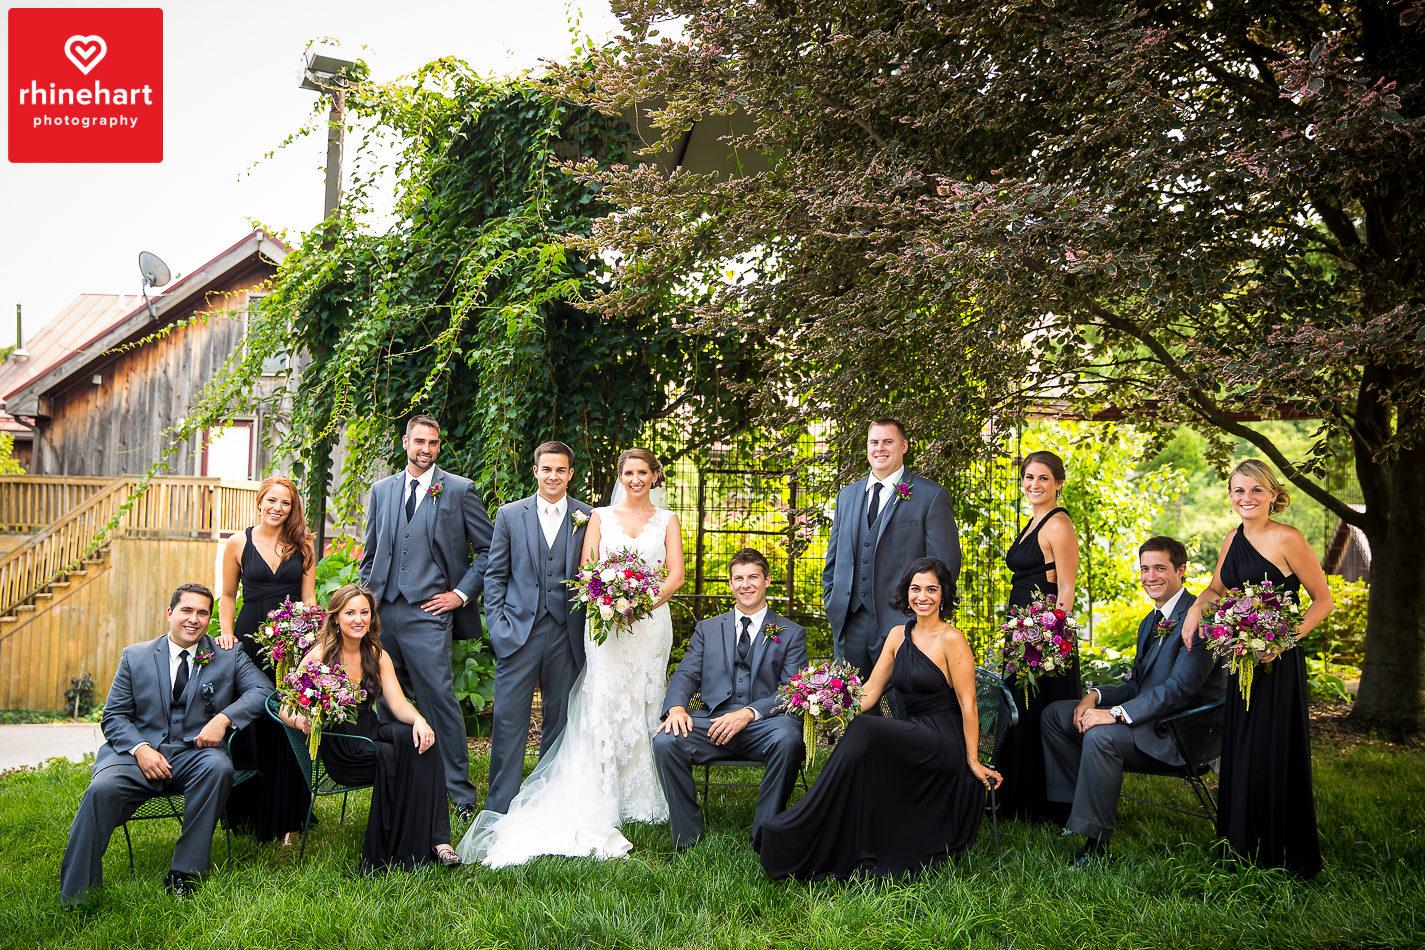 glasbern-inn-wedding-photographer-219